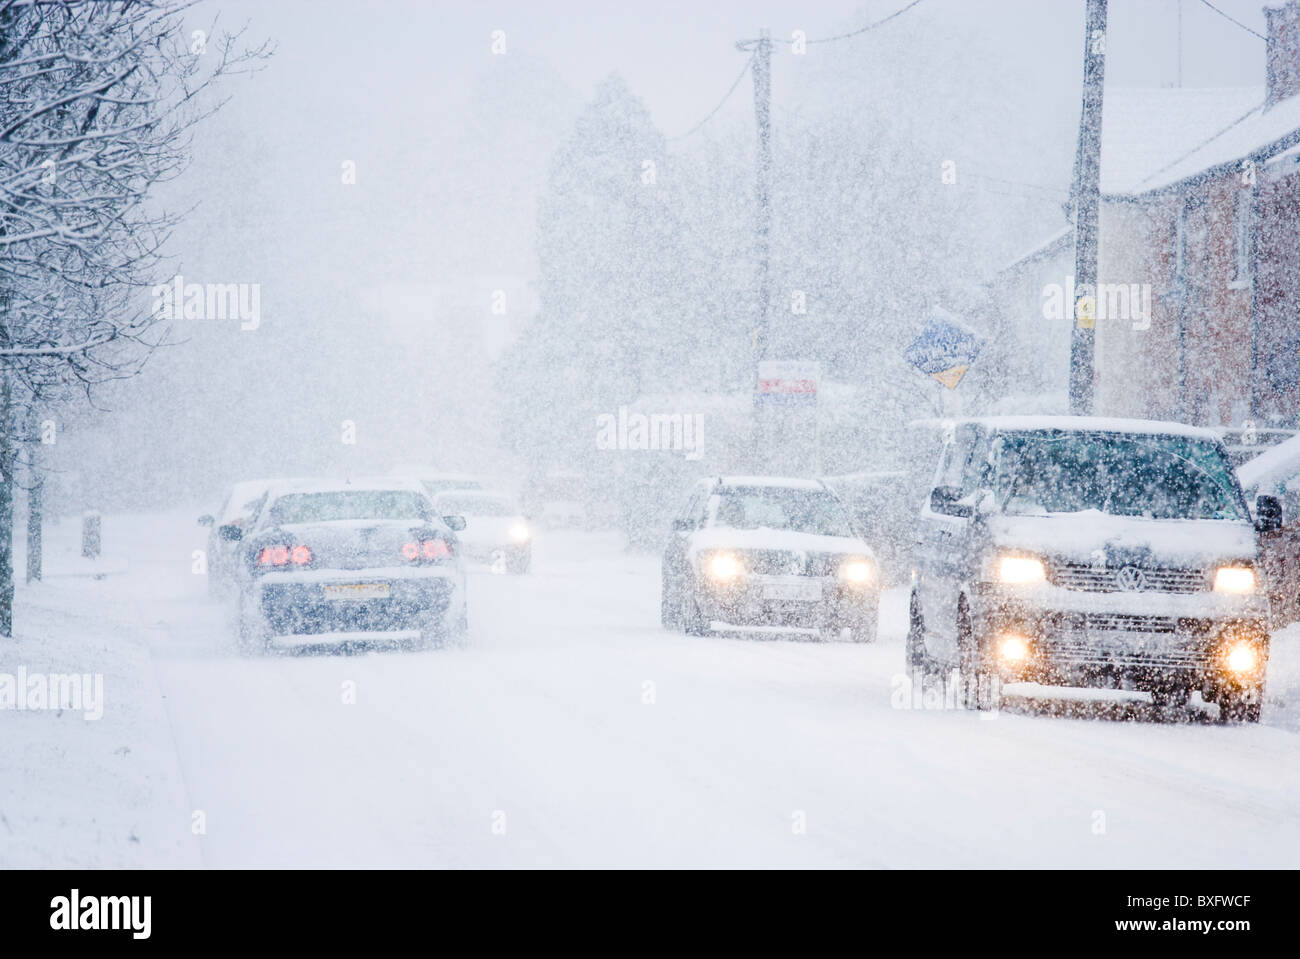 Coches en Blizzard. Surrey, Reino Unido Imagen De Stock